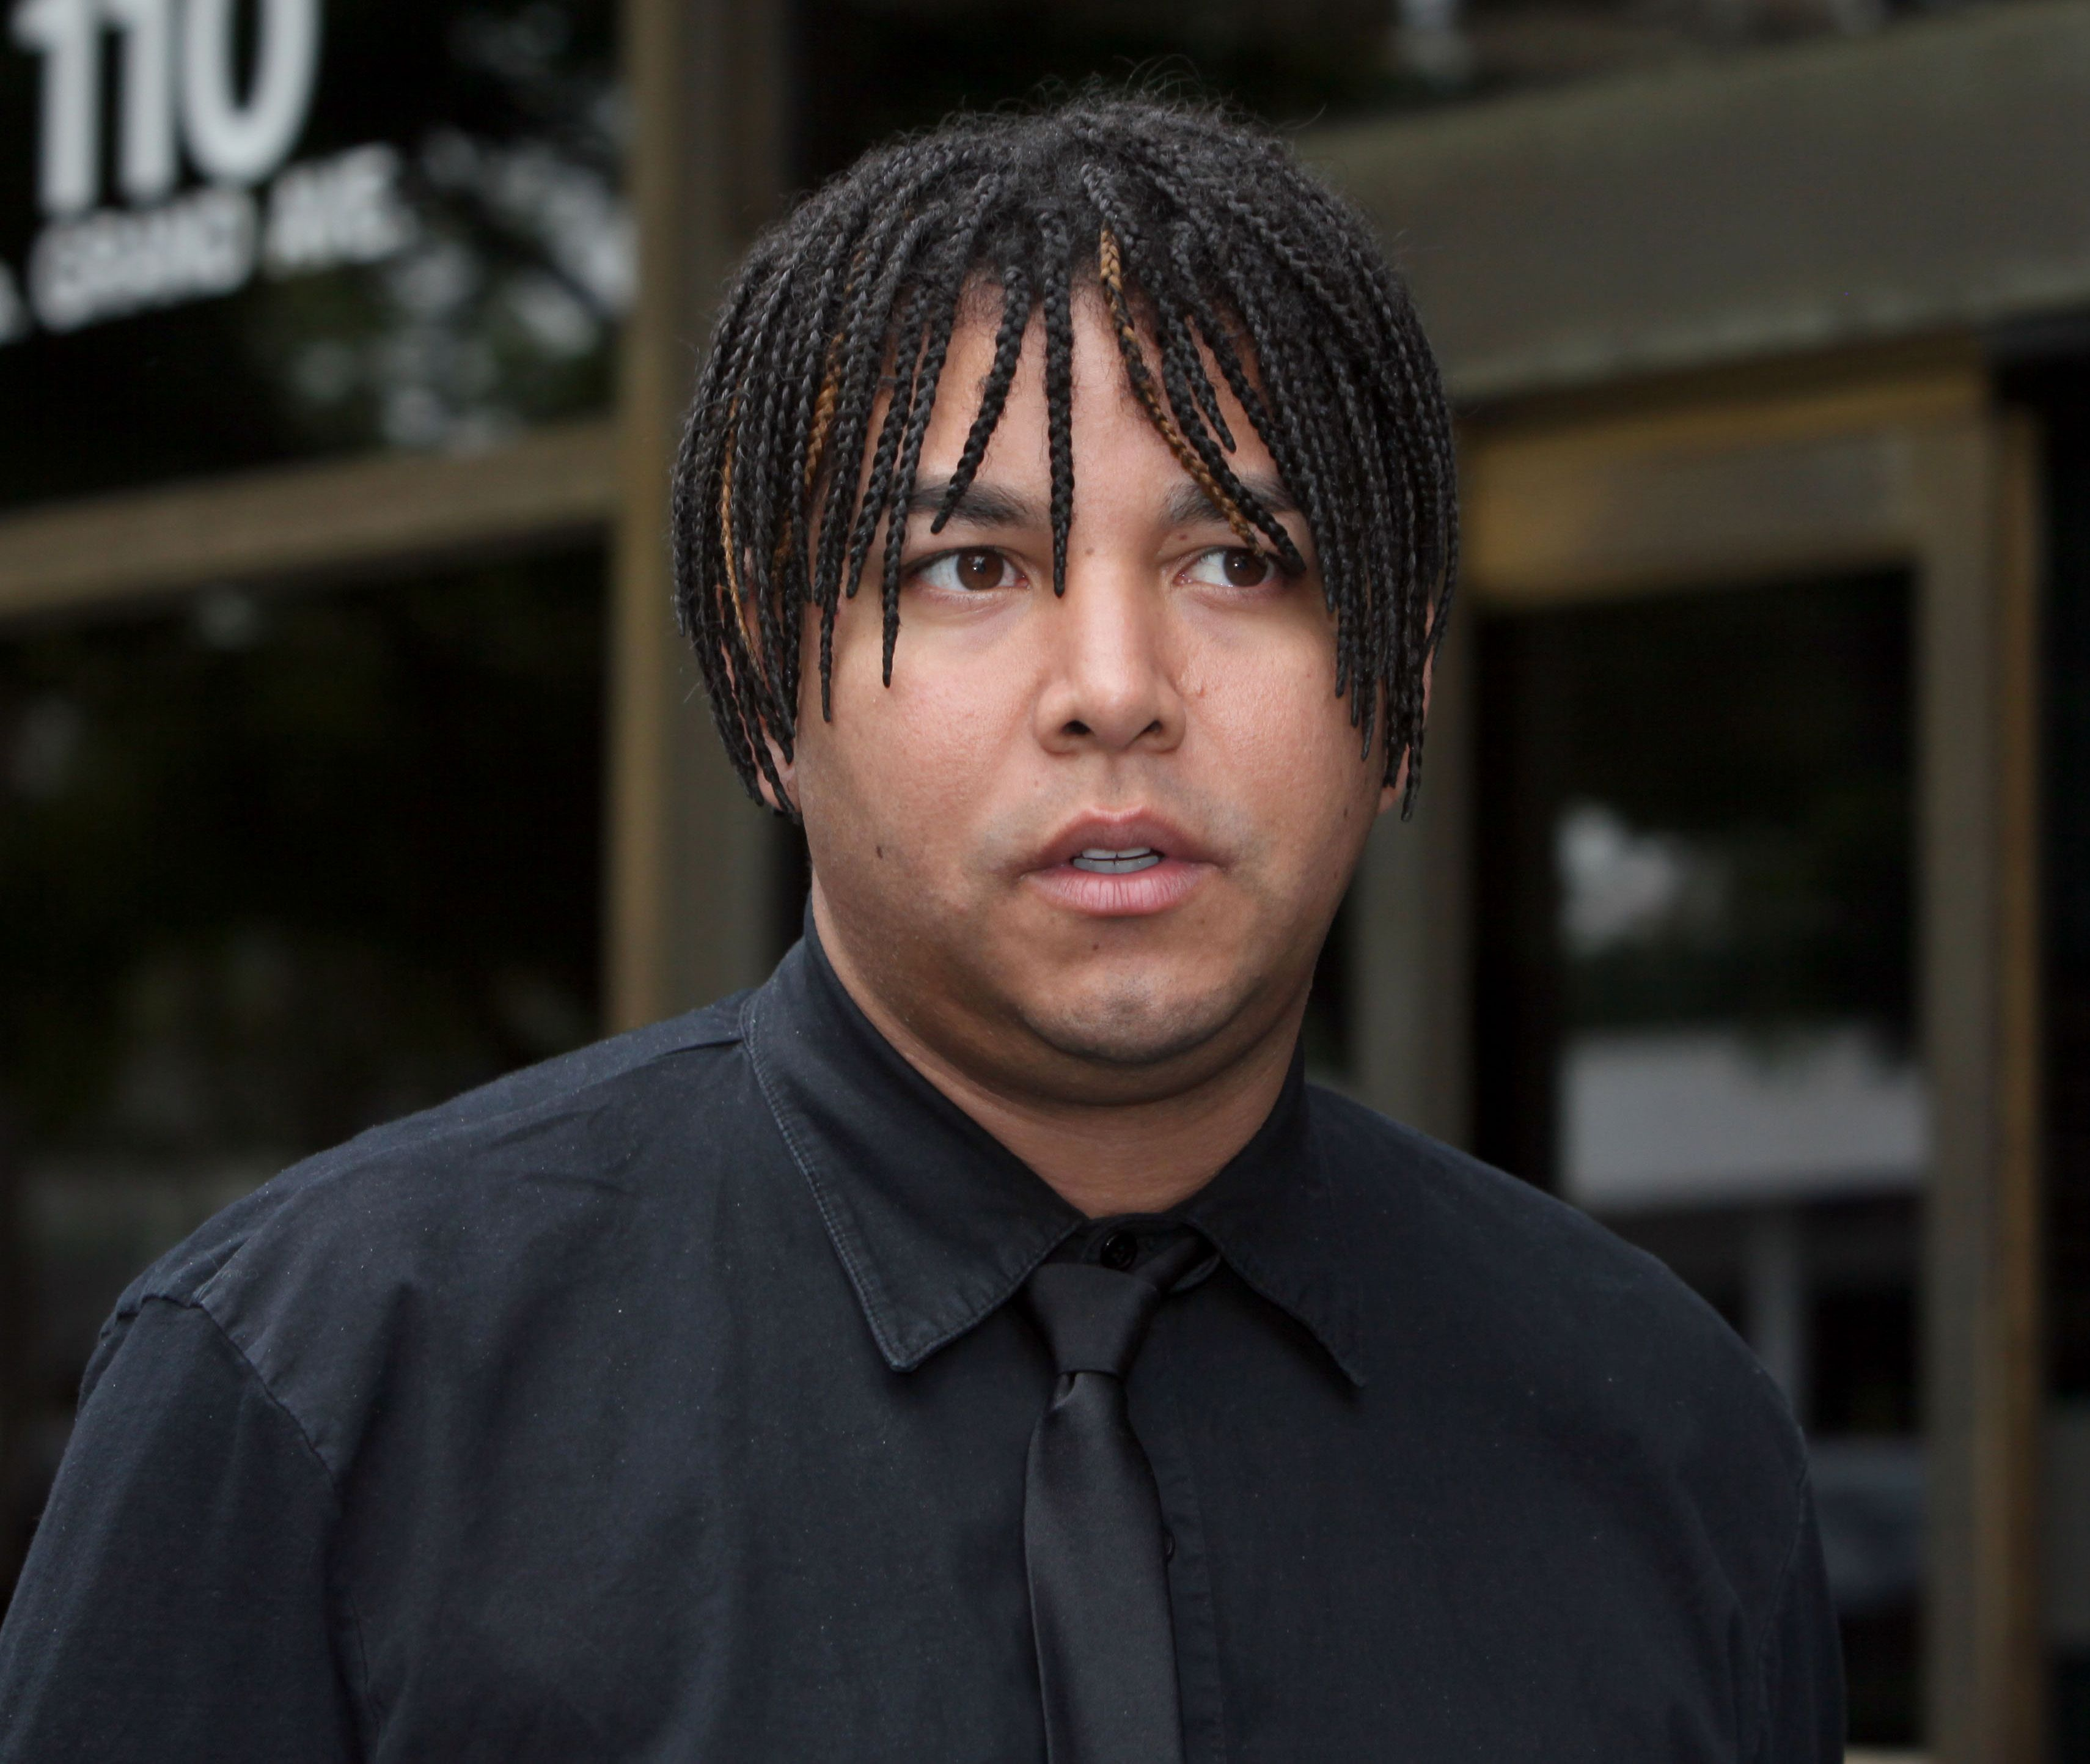 Michael Jackson claims untrue - nephew 259a108aa